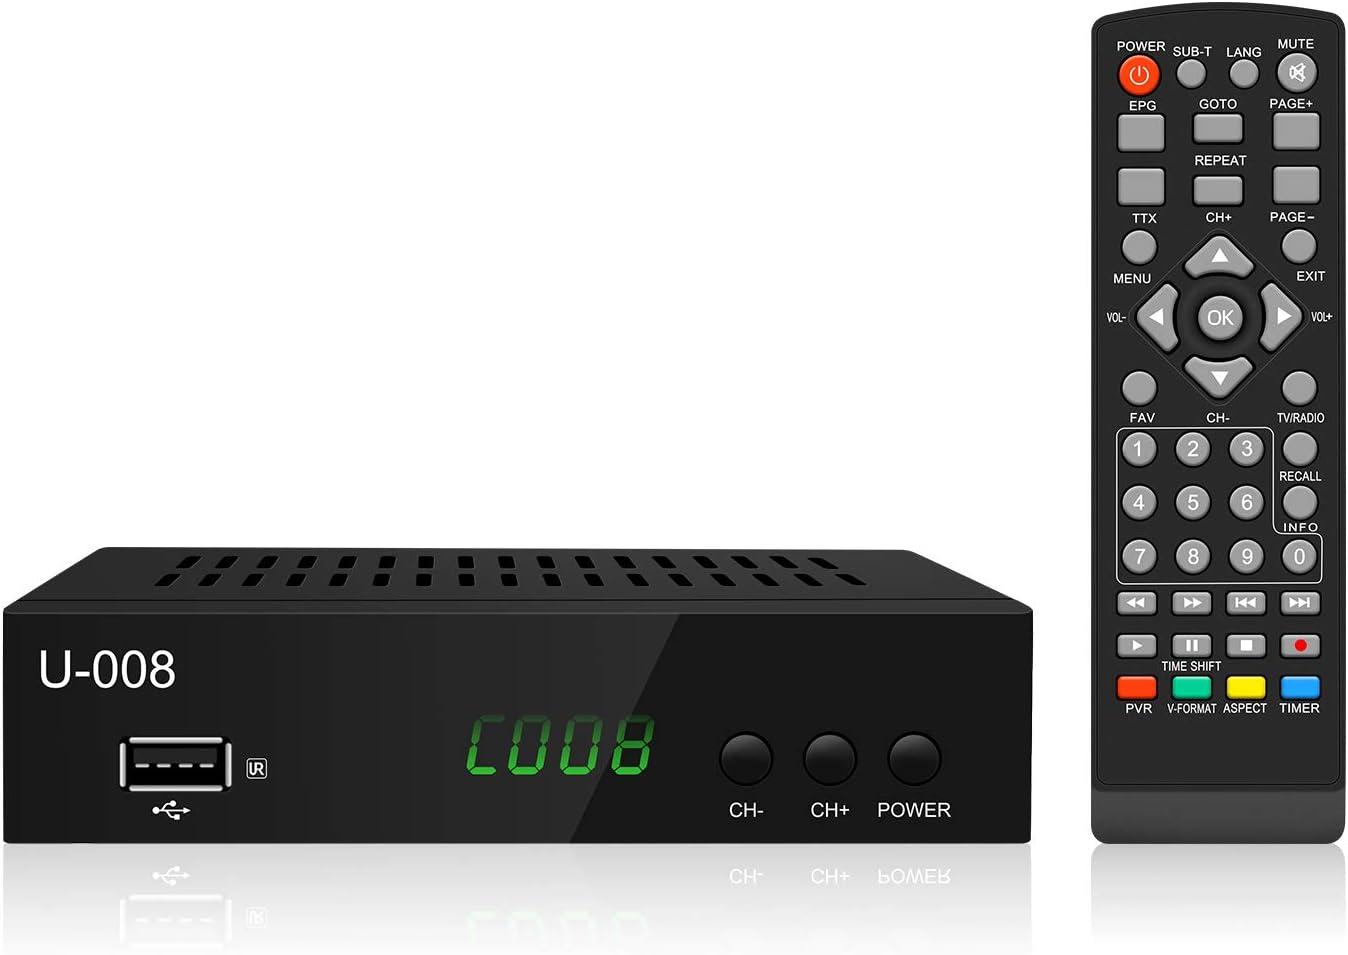 UBISHENG Digital TV Converter Box, 1080P ATSC Digital Converter Box with Recording / Media Player / TV Tuner Function